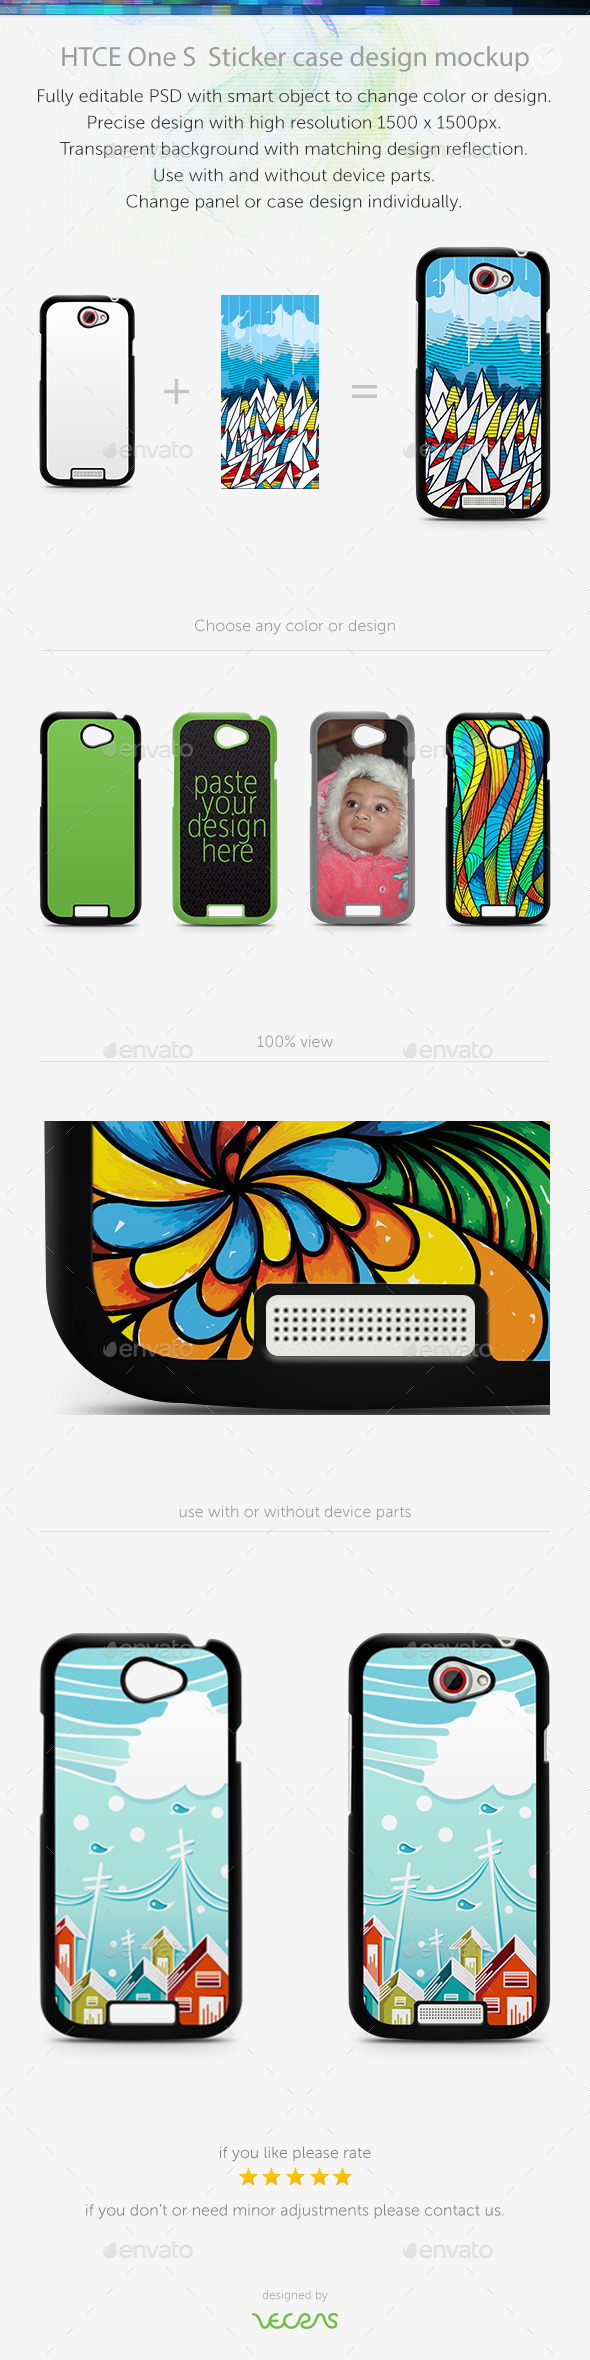 HTCE One S Sticker Case Design Mockup